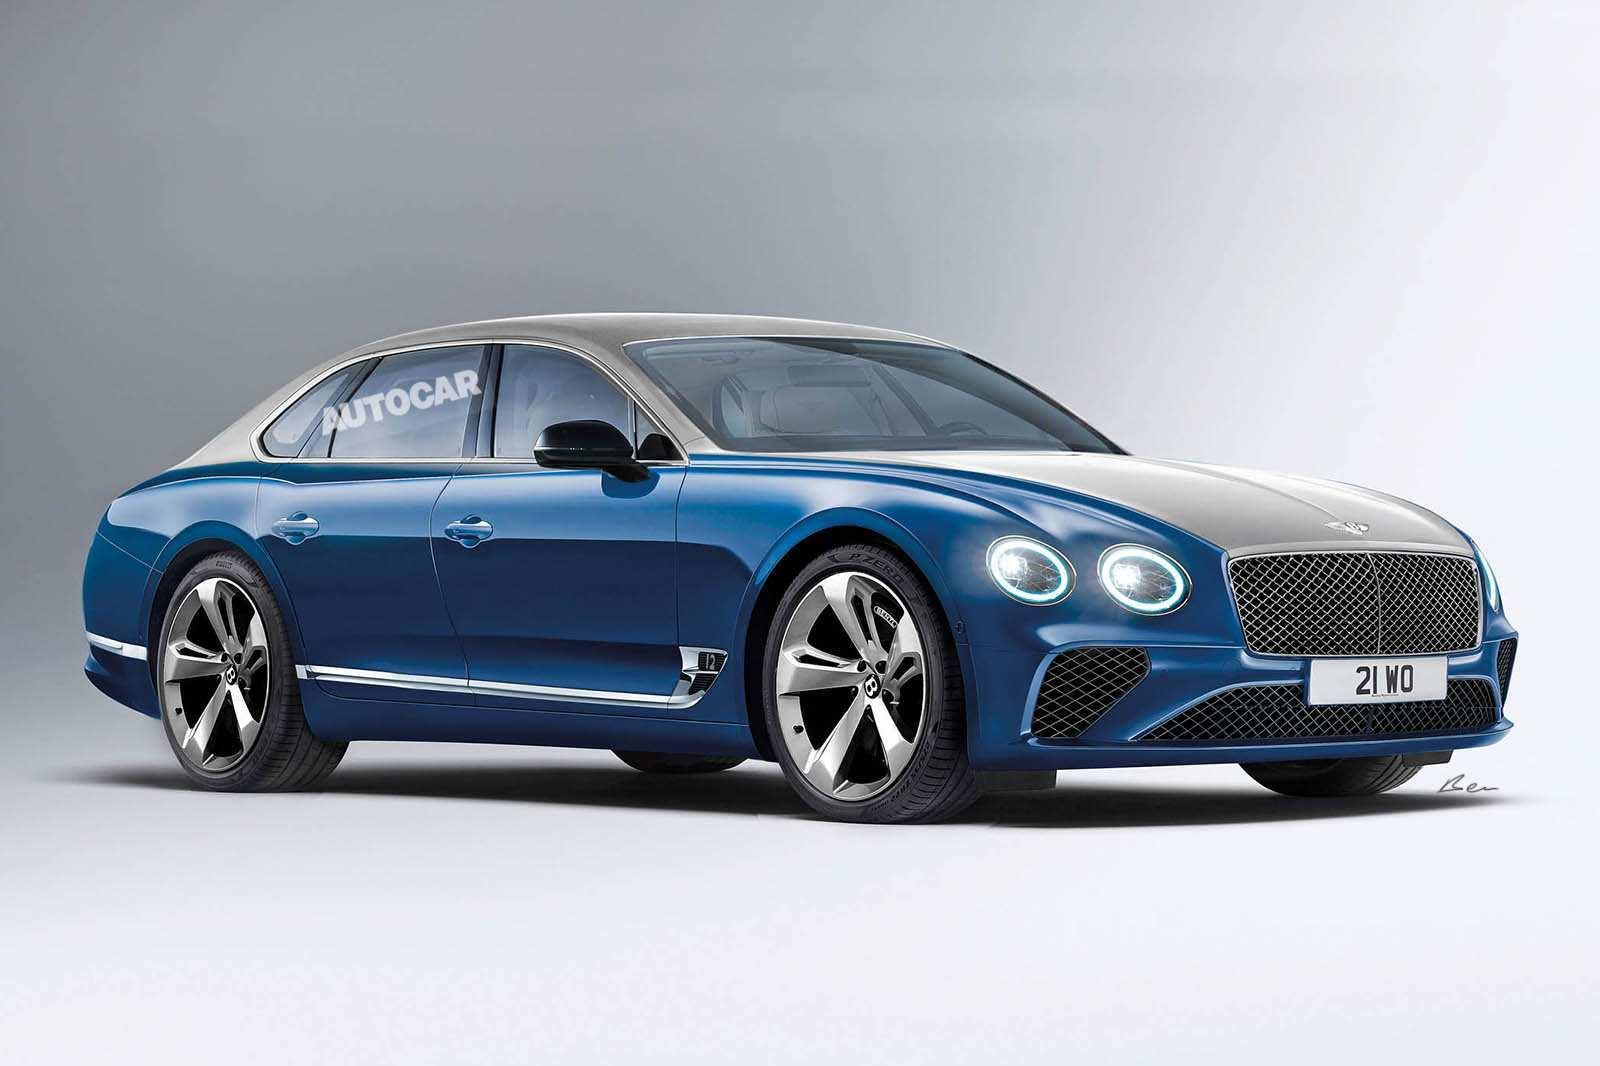 64 All New 2020 Bentley Gt New Concept with 2020 Bentley Gt